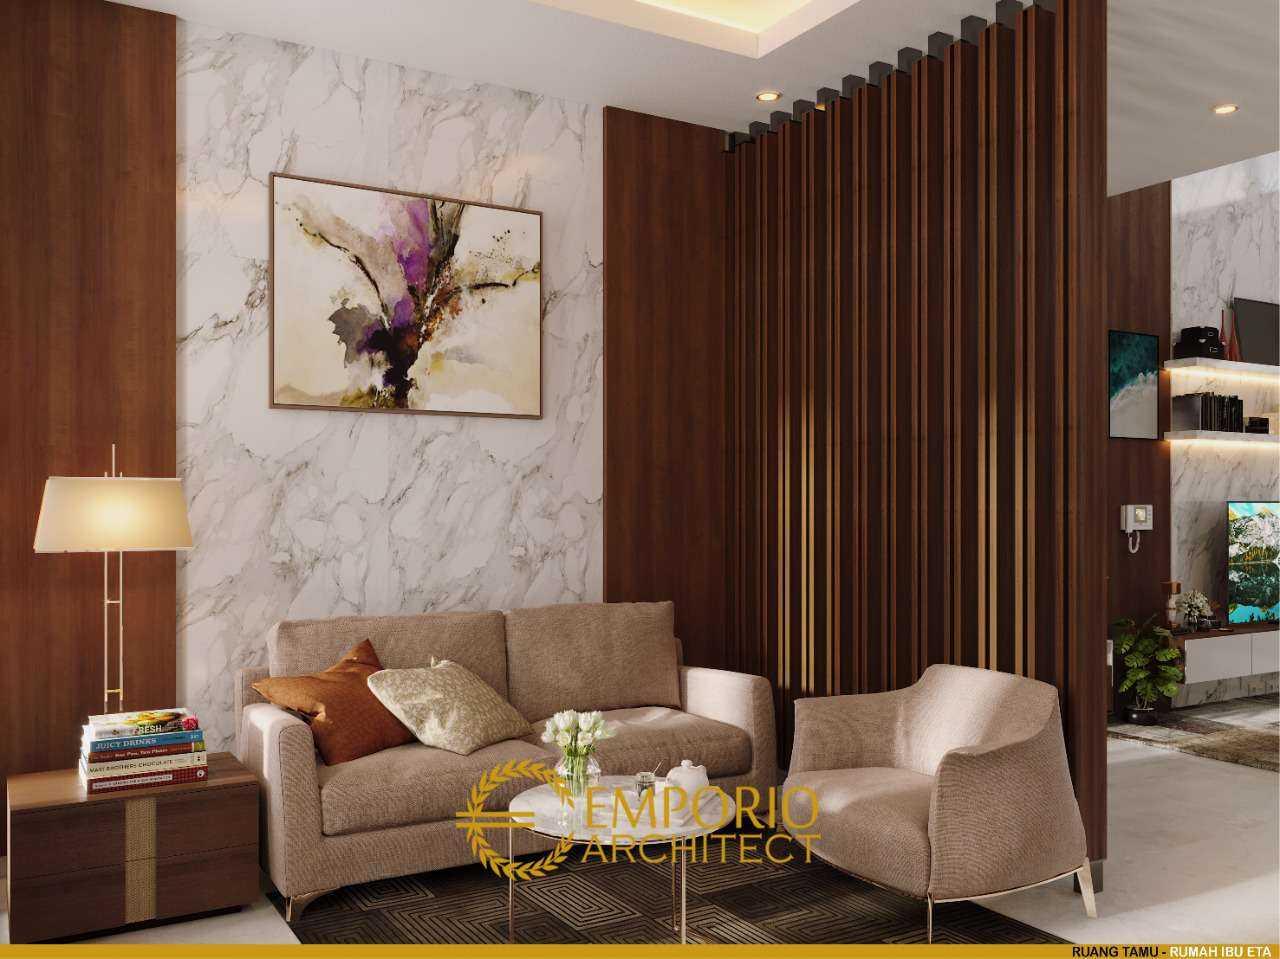 Emporio Architect Jasa Arsitek Denpasar Desain Rumah Modern 2 Lantai 774 @ Denpasar, Bali Kota Denpasar, Bali, Indonesia Kota Denpasar, Bali, Indonesia Emporio-Architect-Jasa-Arsitek-Denpasar-Desain-Rumah-Modern-2-Lantai-774-Denpasar-Bali  88264